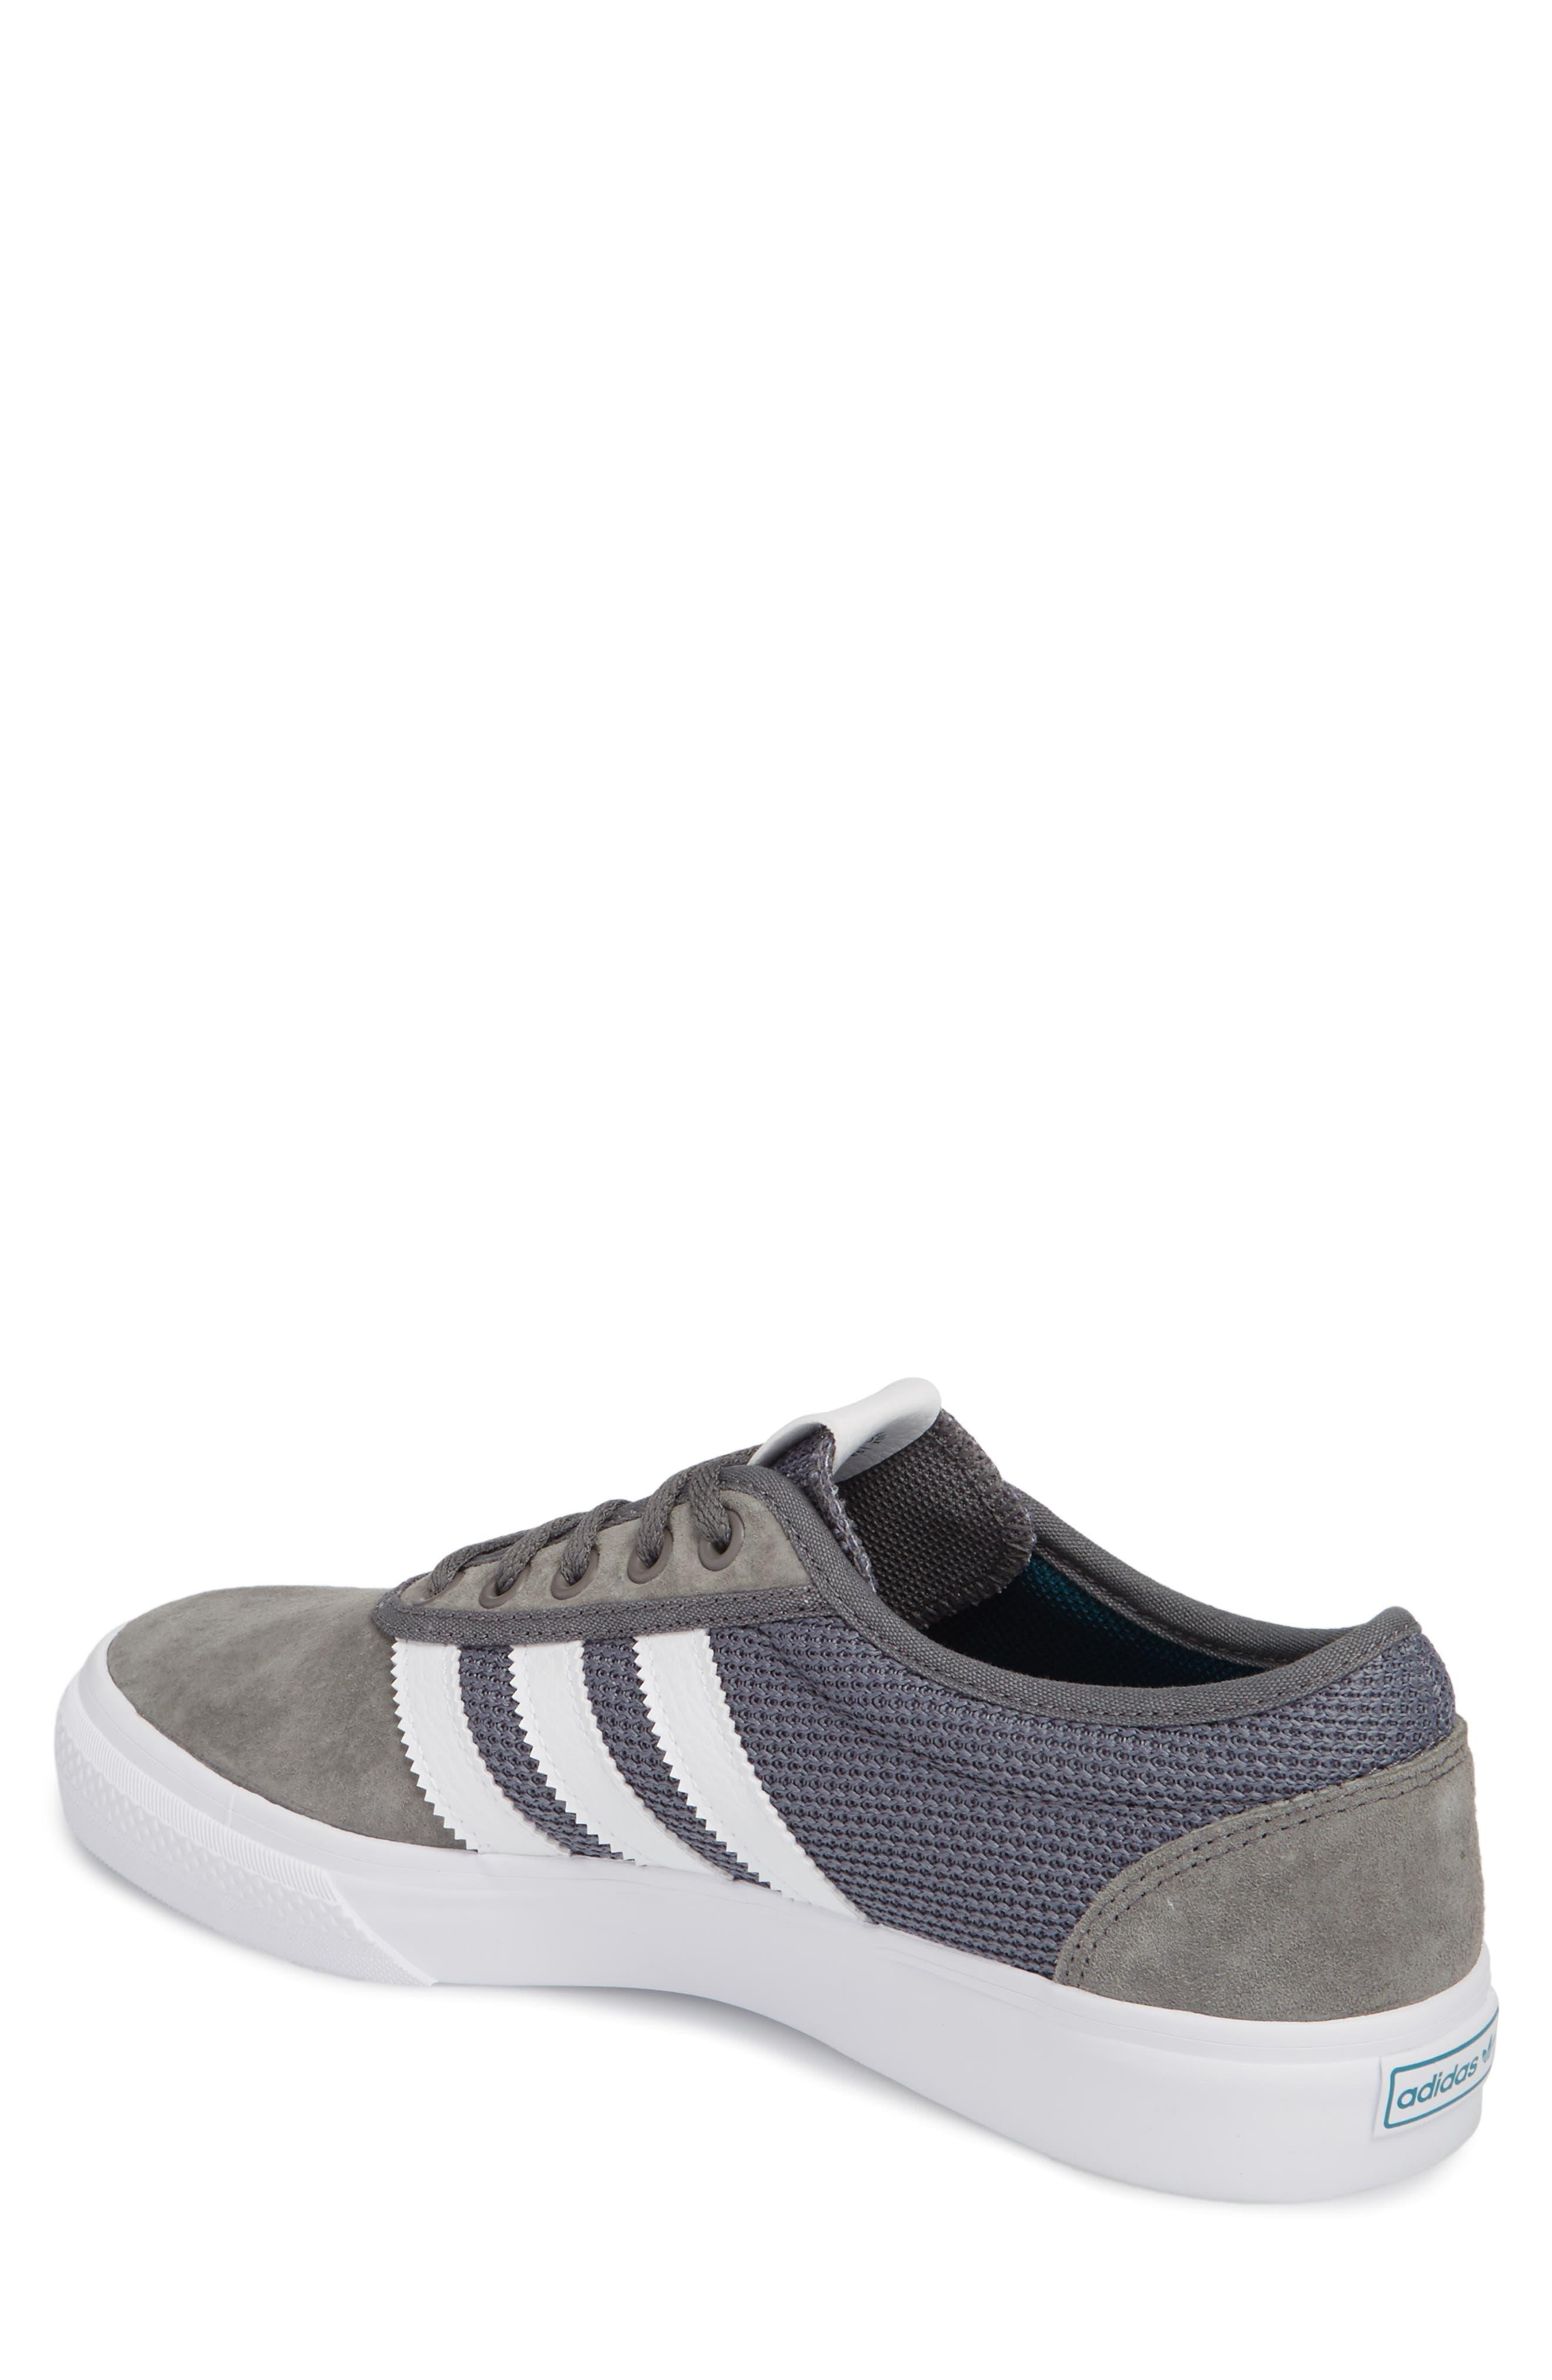 adi-Ease Sneaker,                             Alternate thumbnail 2, color,                             023